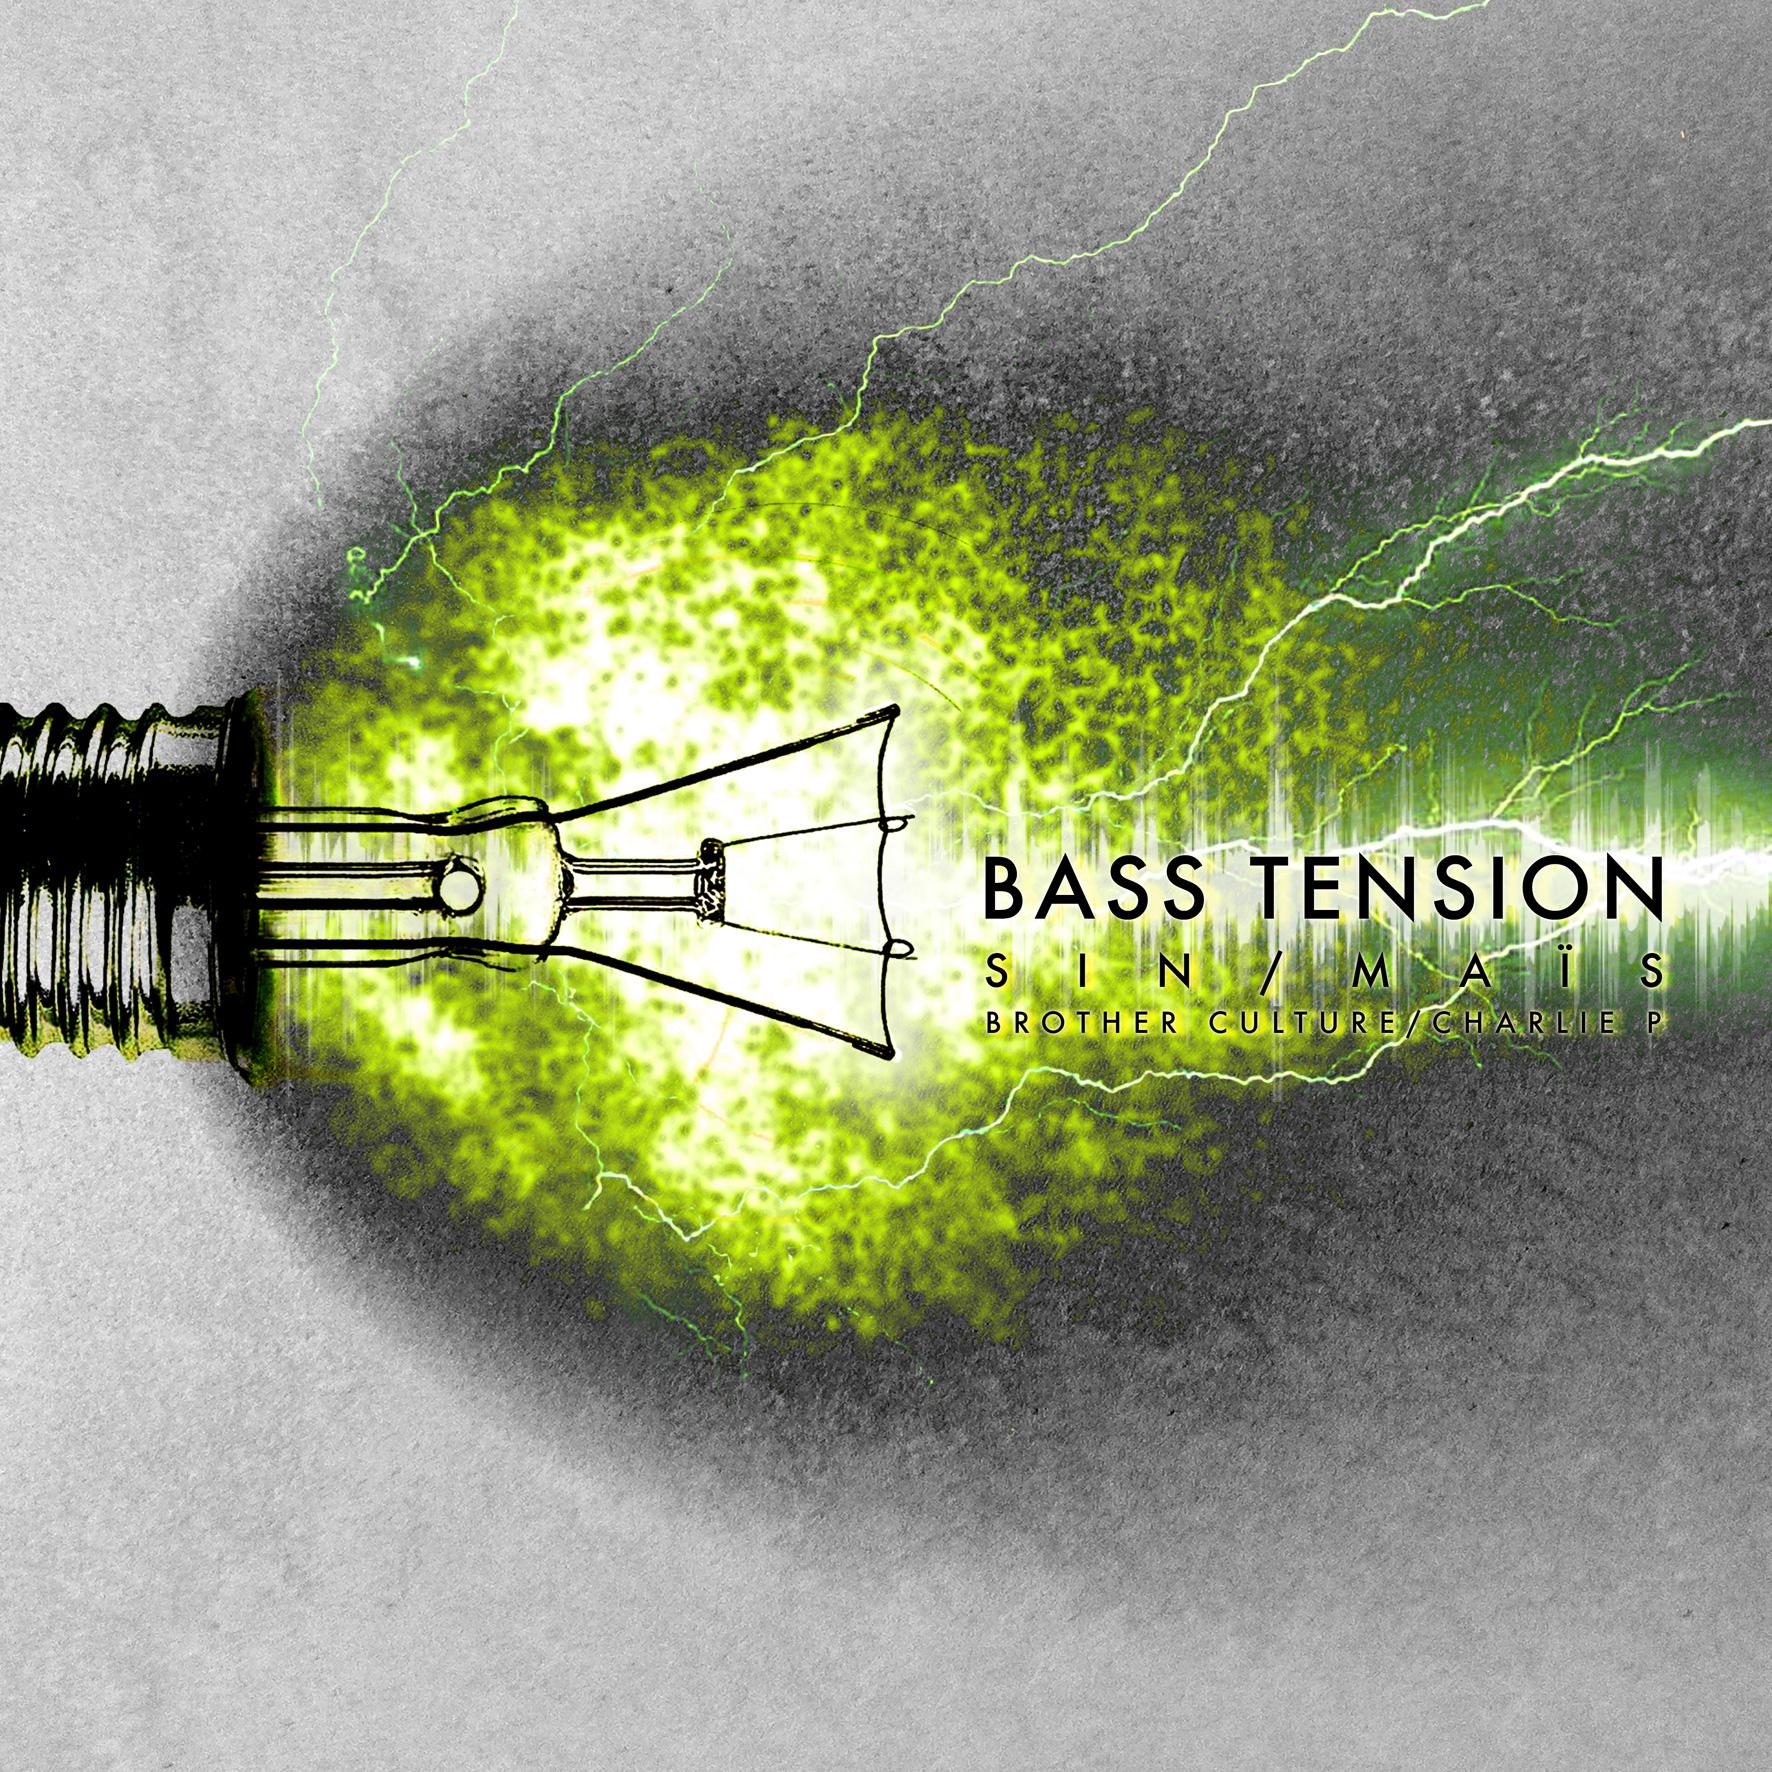 BASS TENSION